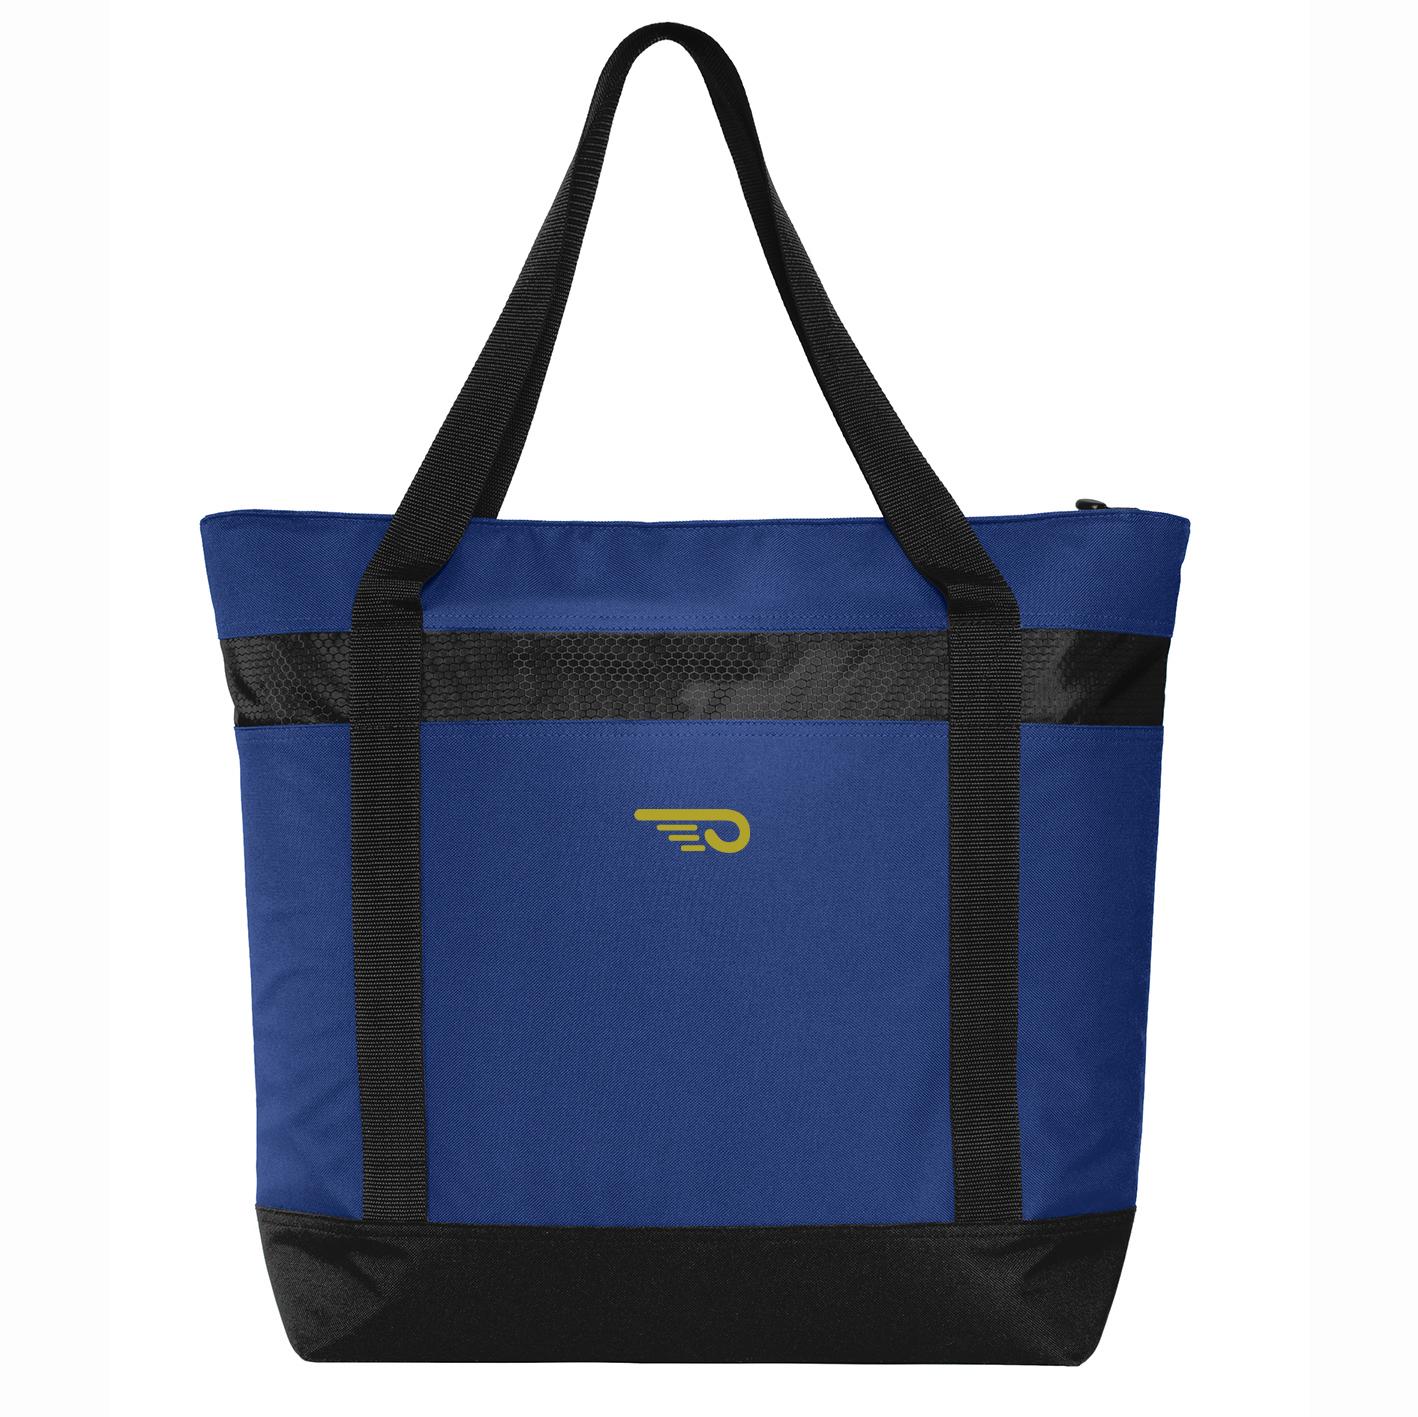 Hinckley Yachts - Cooler Tote Bag